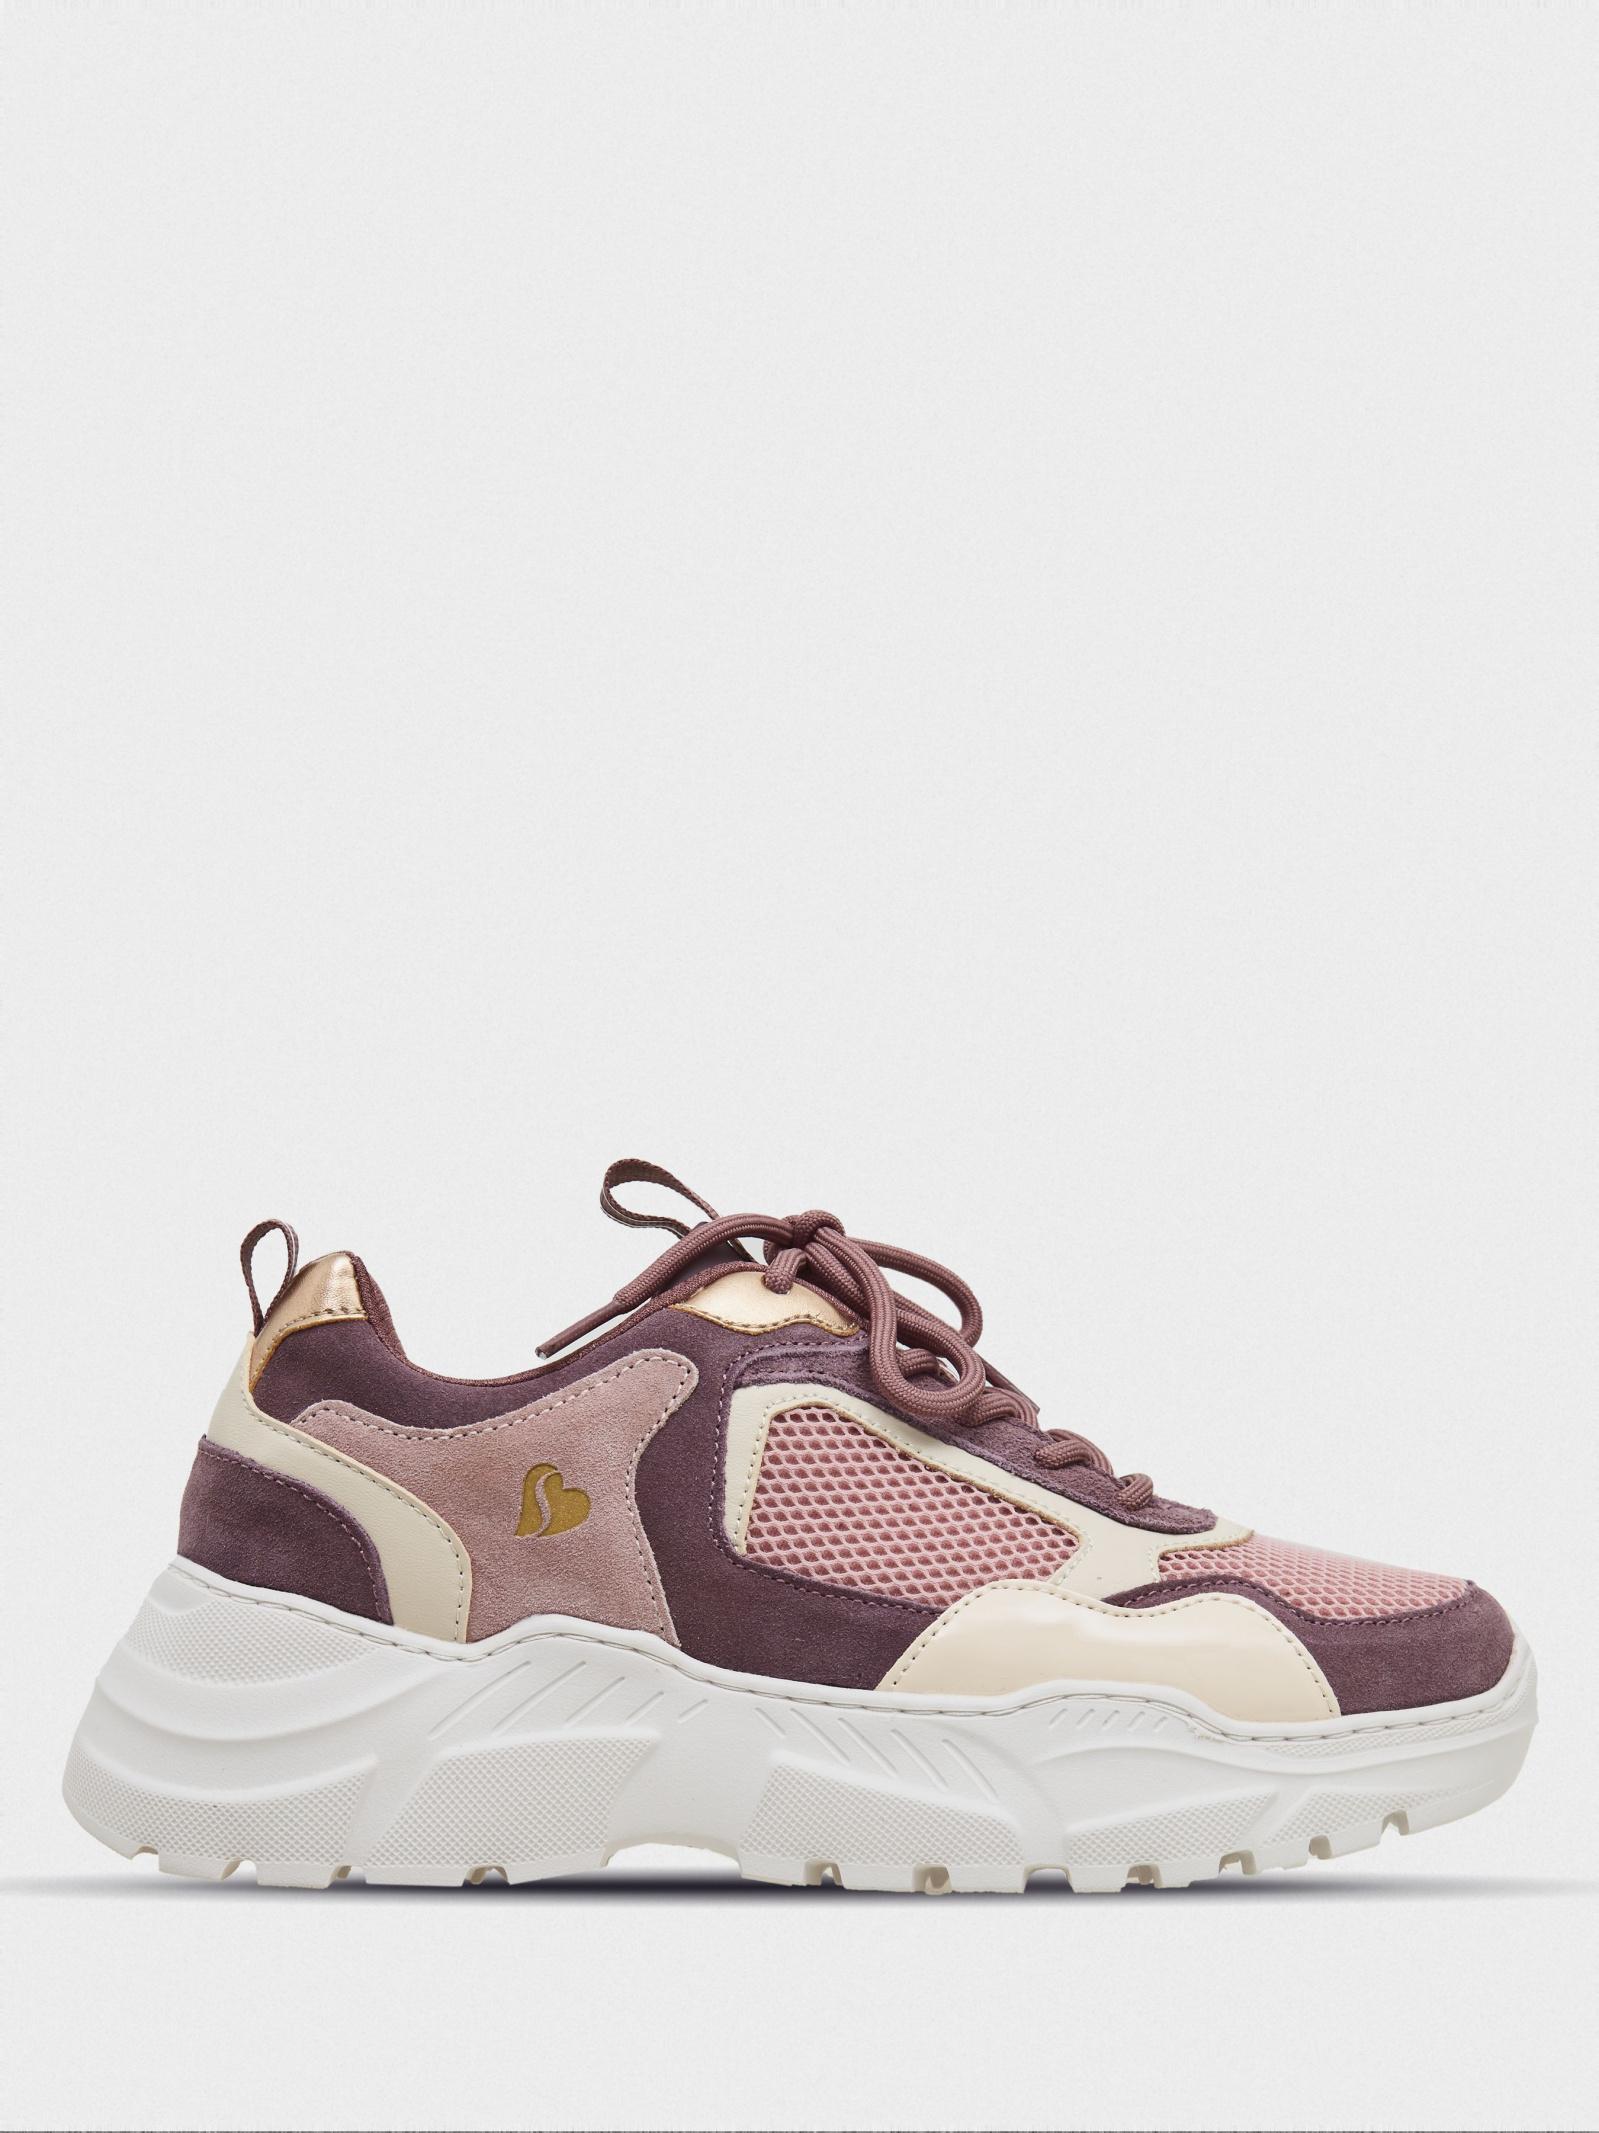 Кроссовки для женщин Skechers KW5198 продажа, 2017